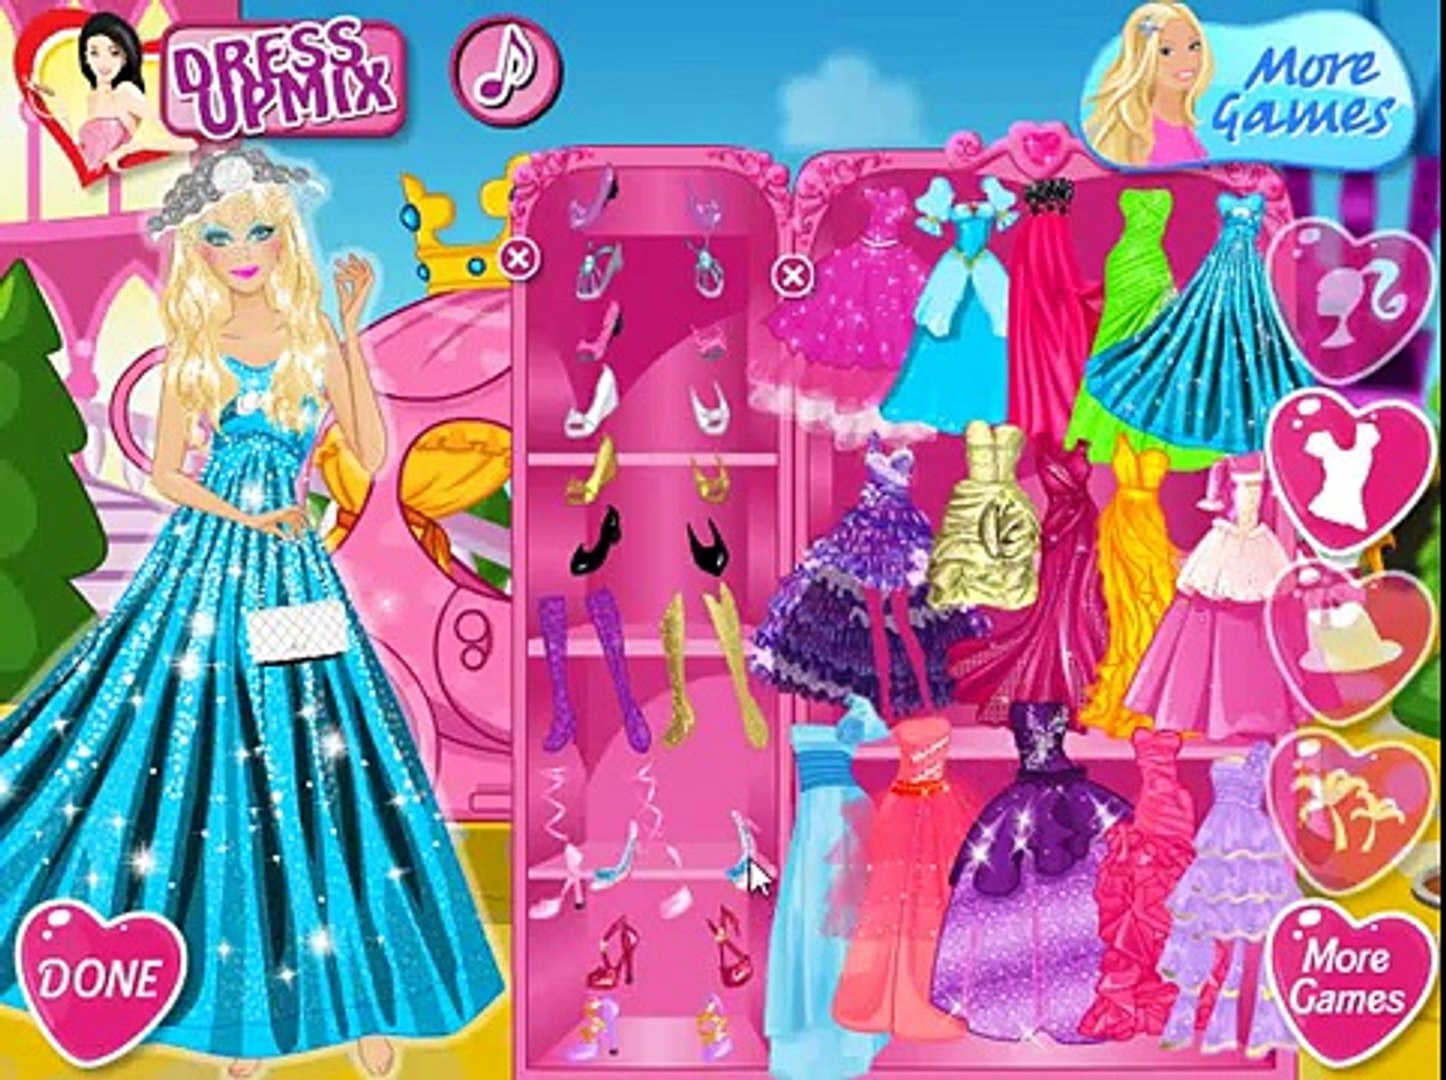 Мультфильм: Принцесса Барби спешит на бал / Princess Barbie goes to the ball